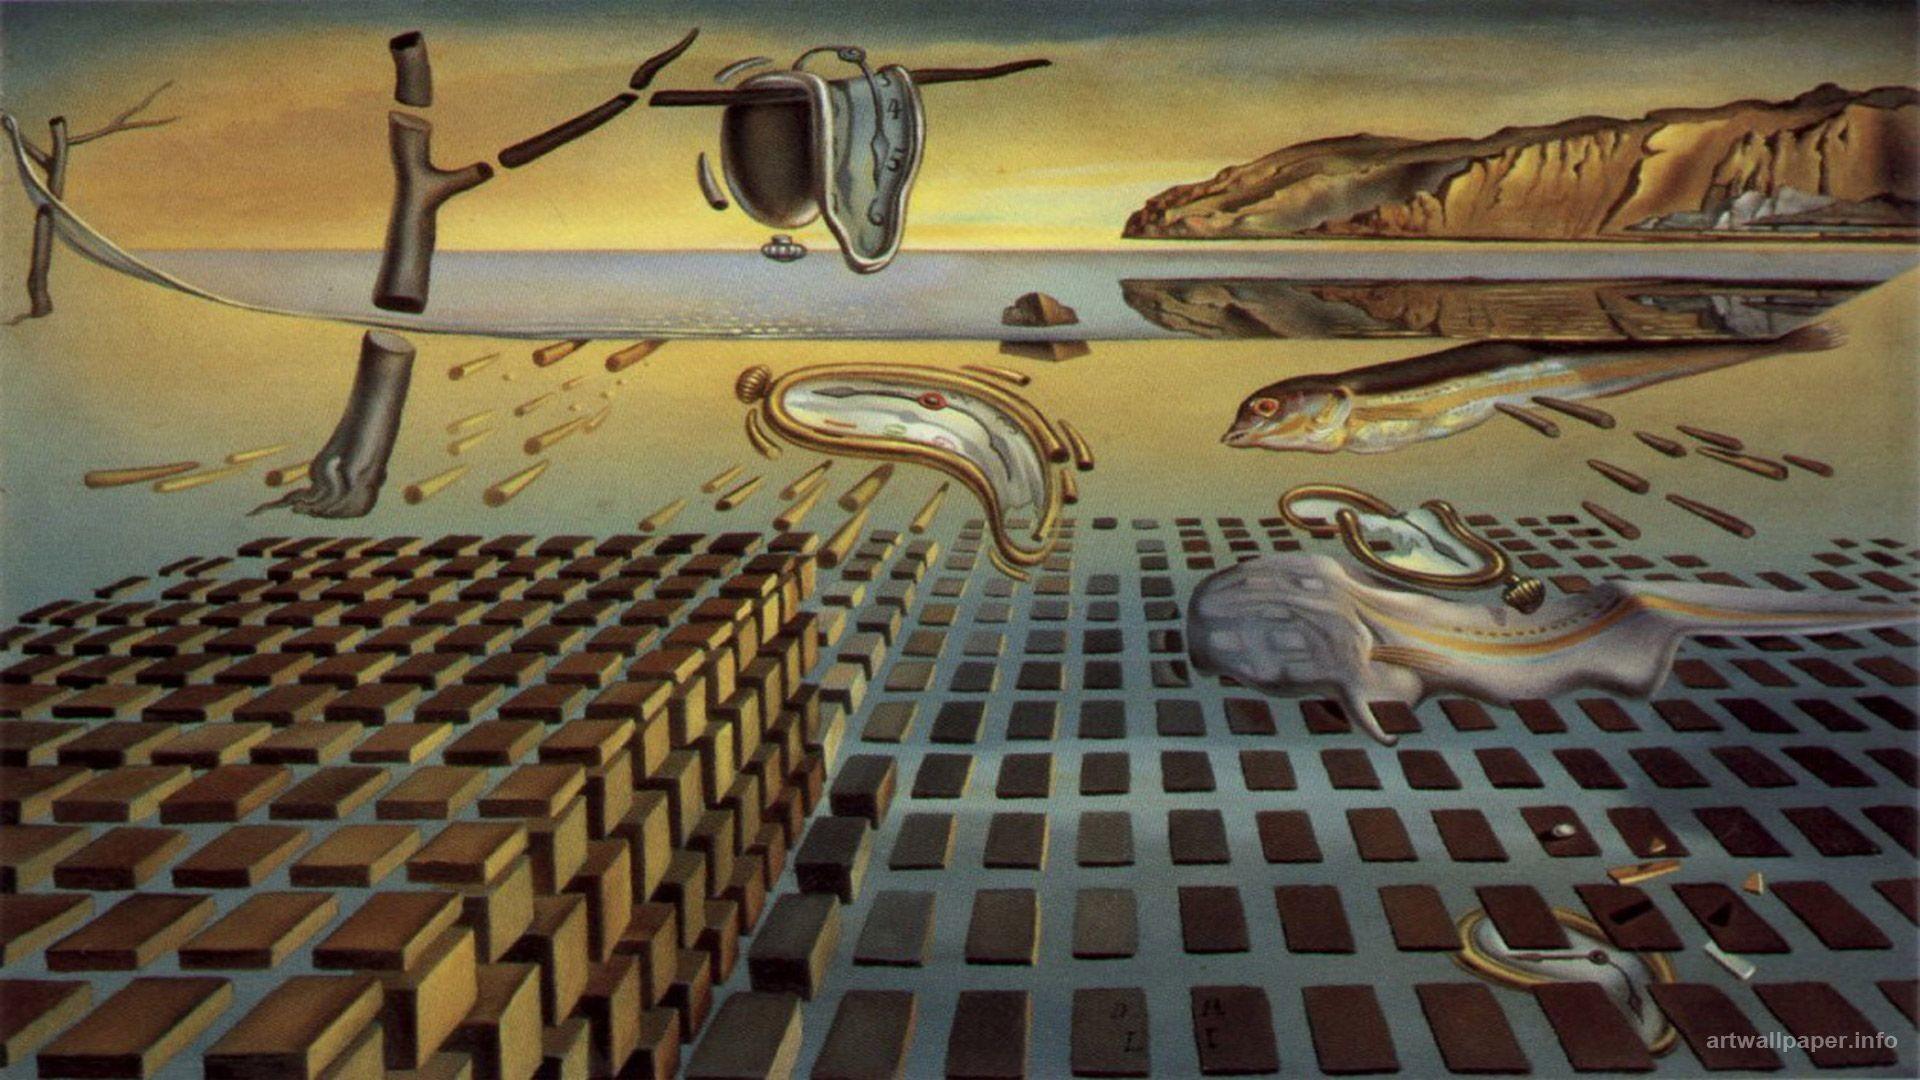 Dali Iphone Wallpaper Rene Magritte Wallpaper 61 Images